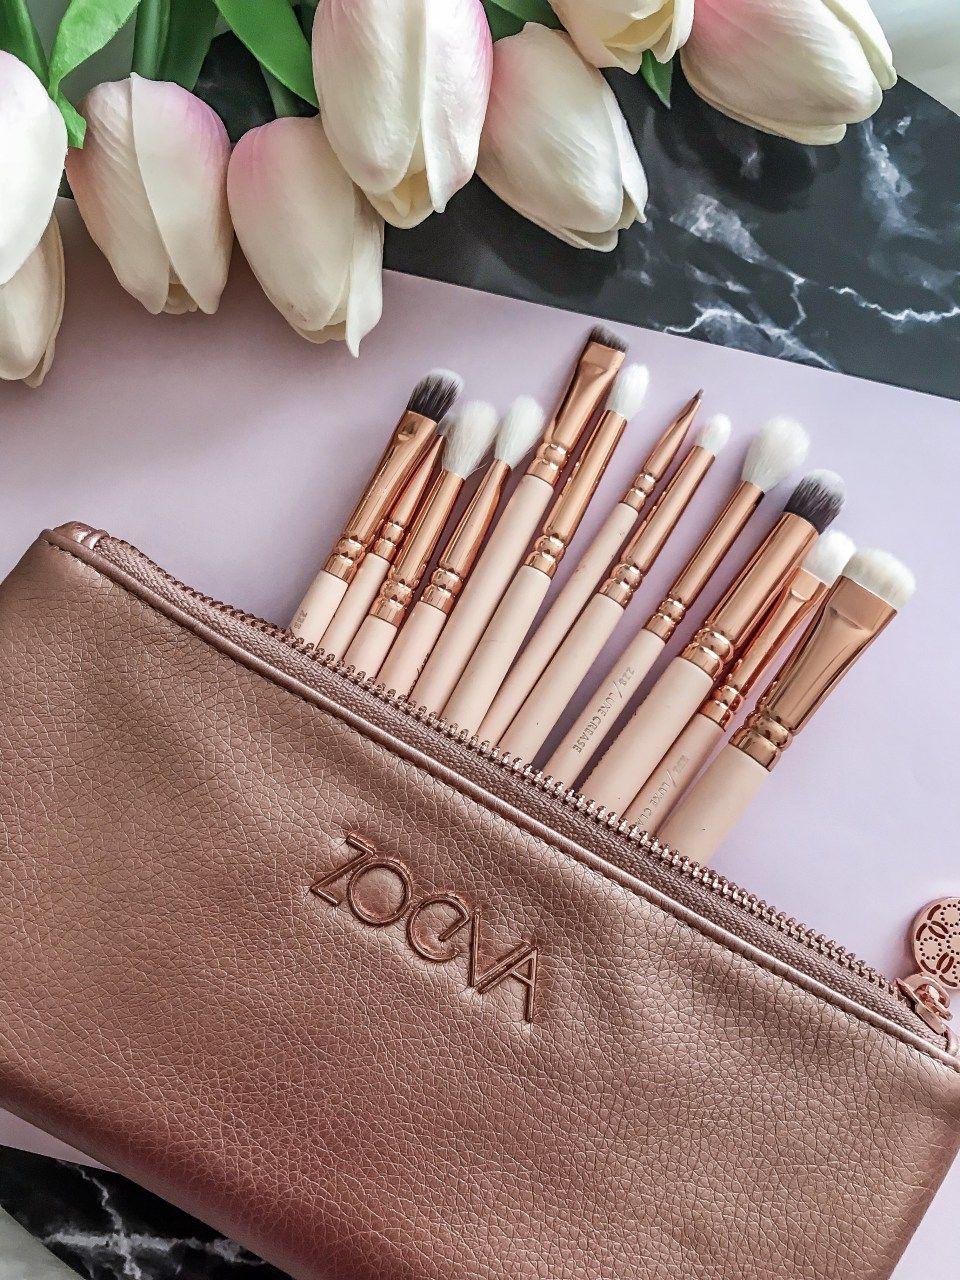 Zoeva Makeup Brushes A Review Zoeva makeup brushes